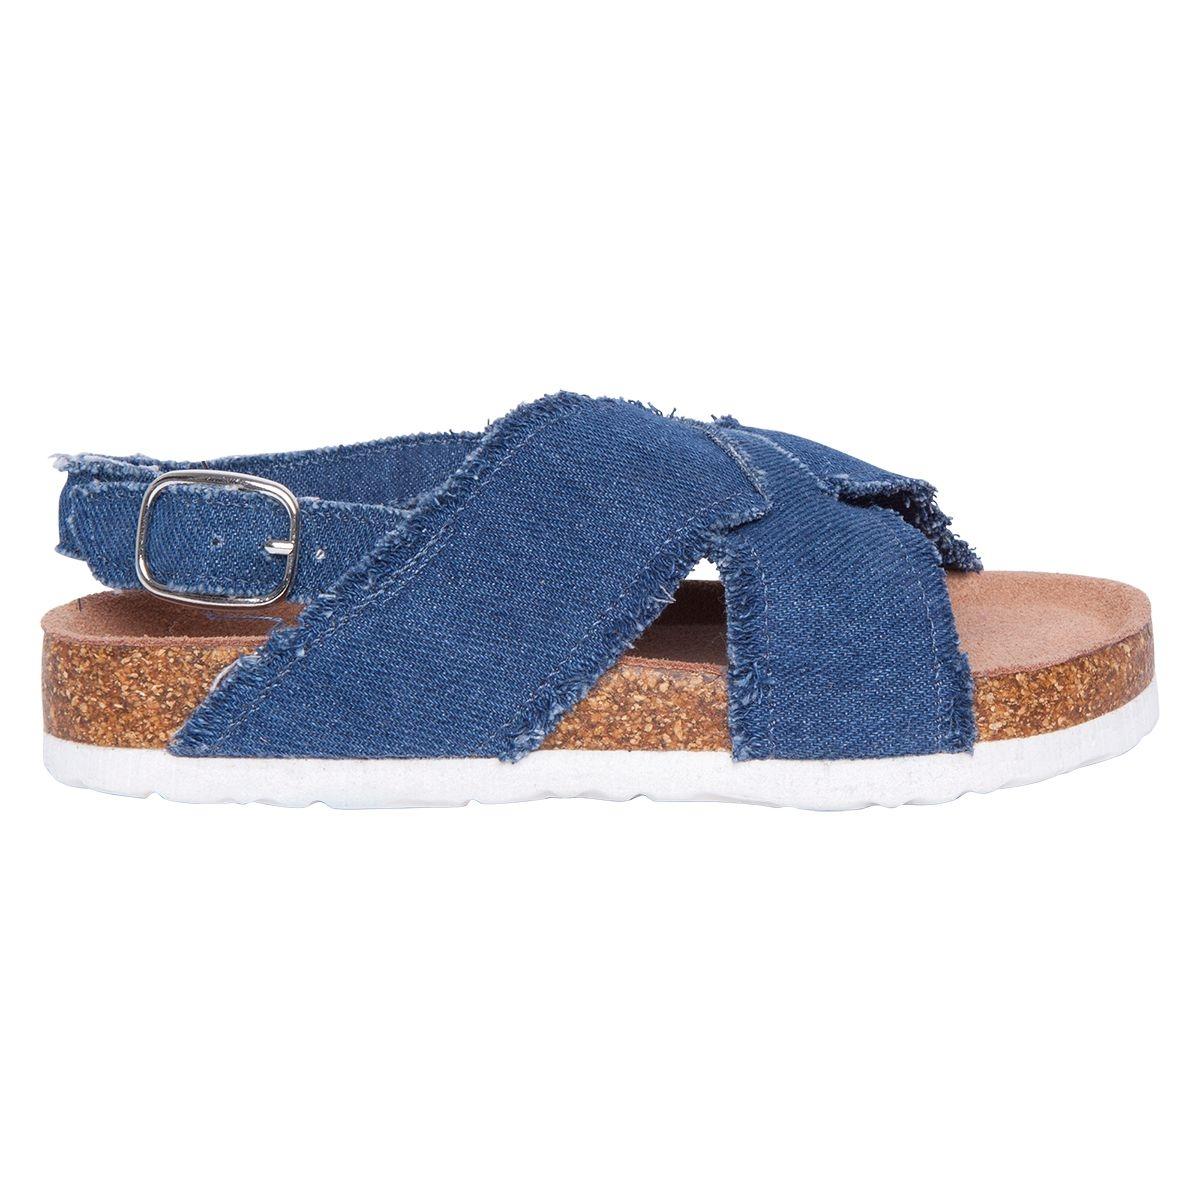 Sandales en jeans arrecife de motif dos